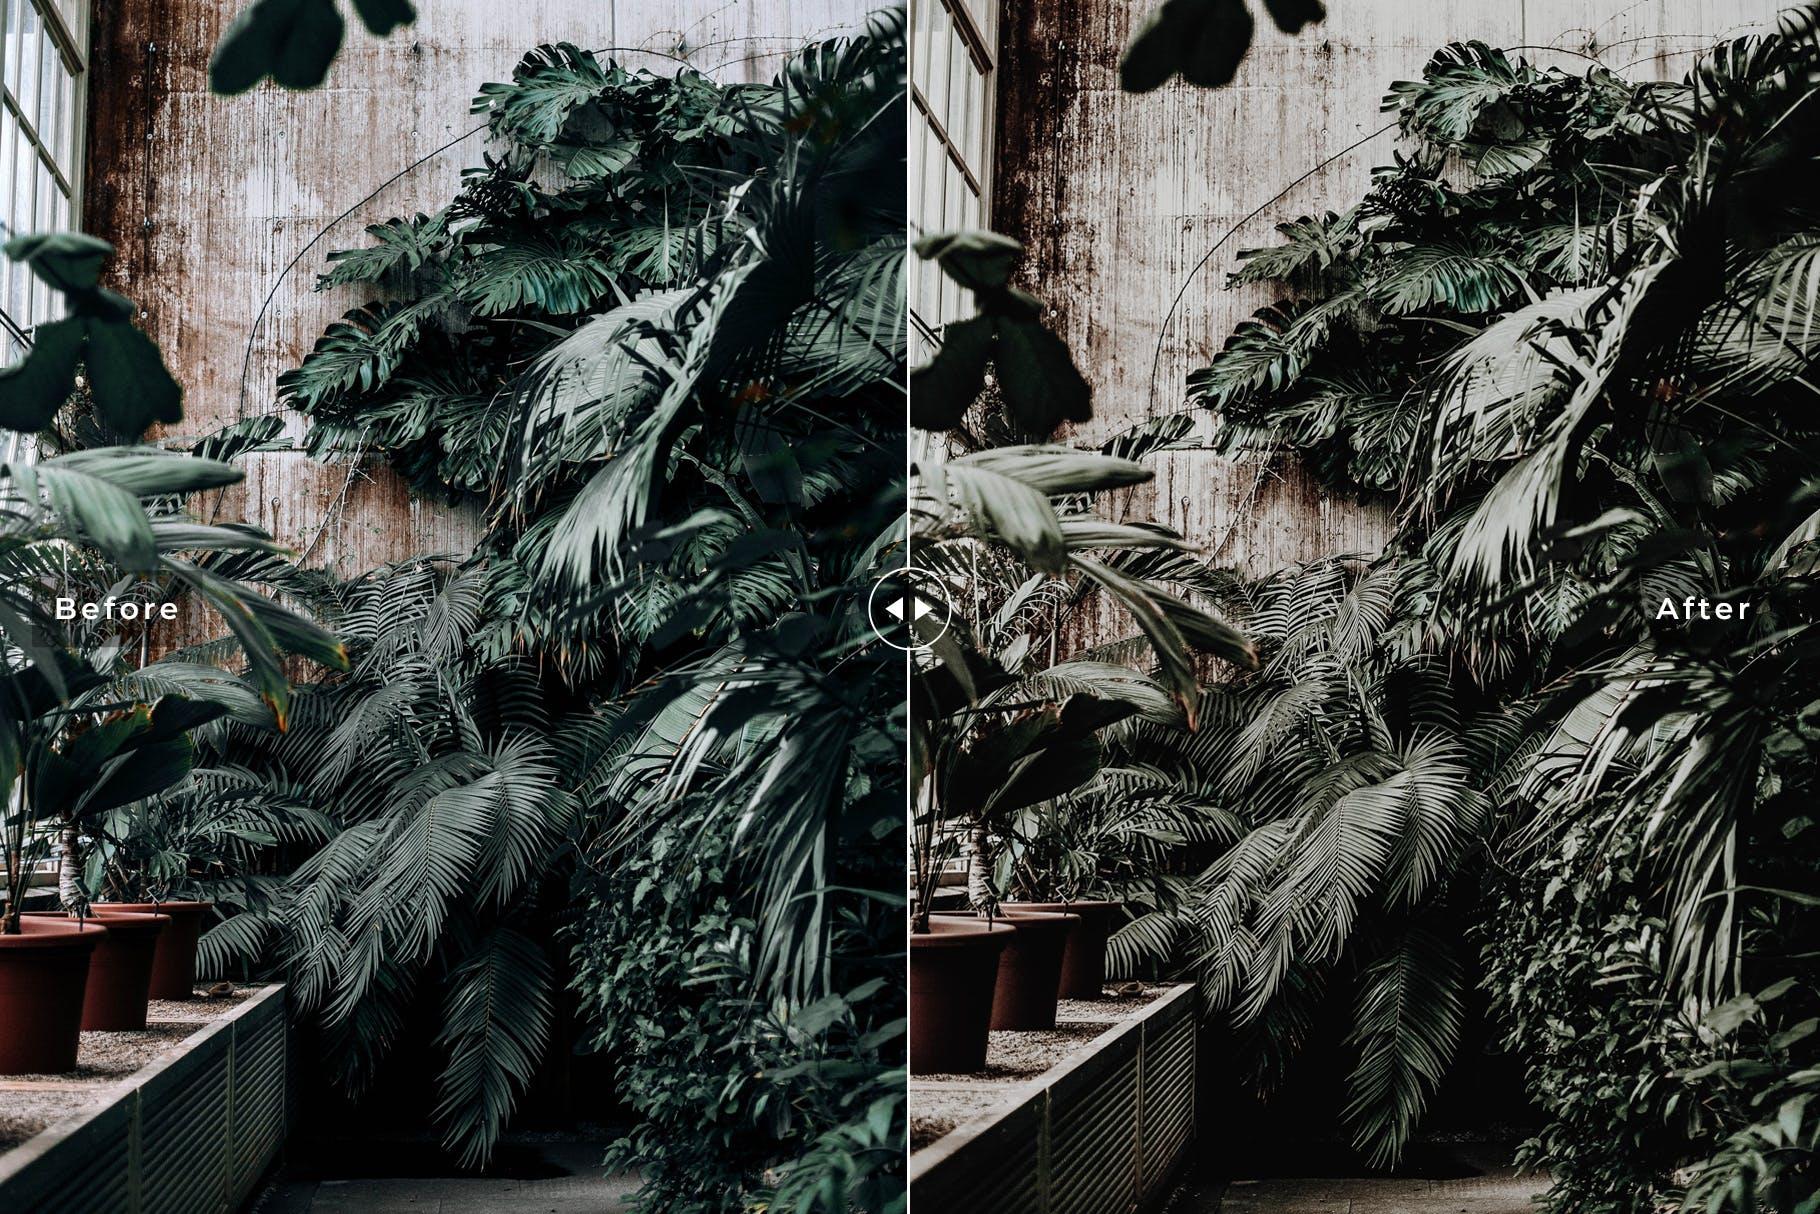 菜鸟也能产出大师摄影作品-LR照片调色预设 Botanical Mobile & Desktop Lightroom Presets设计素材模板